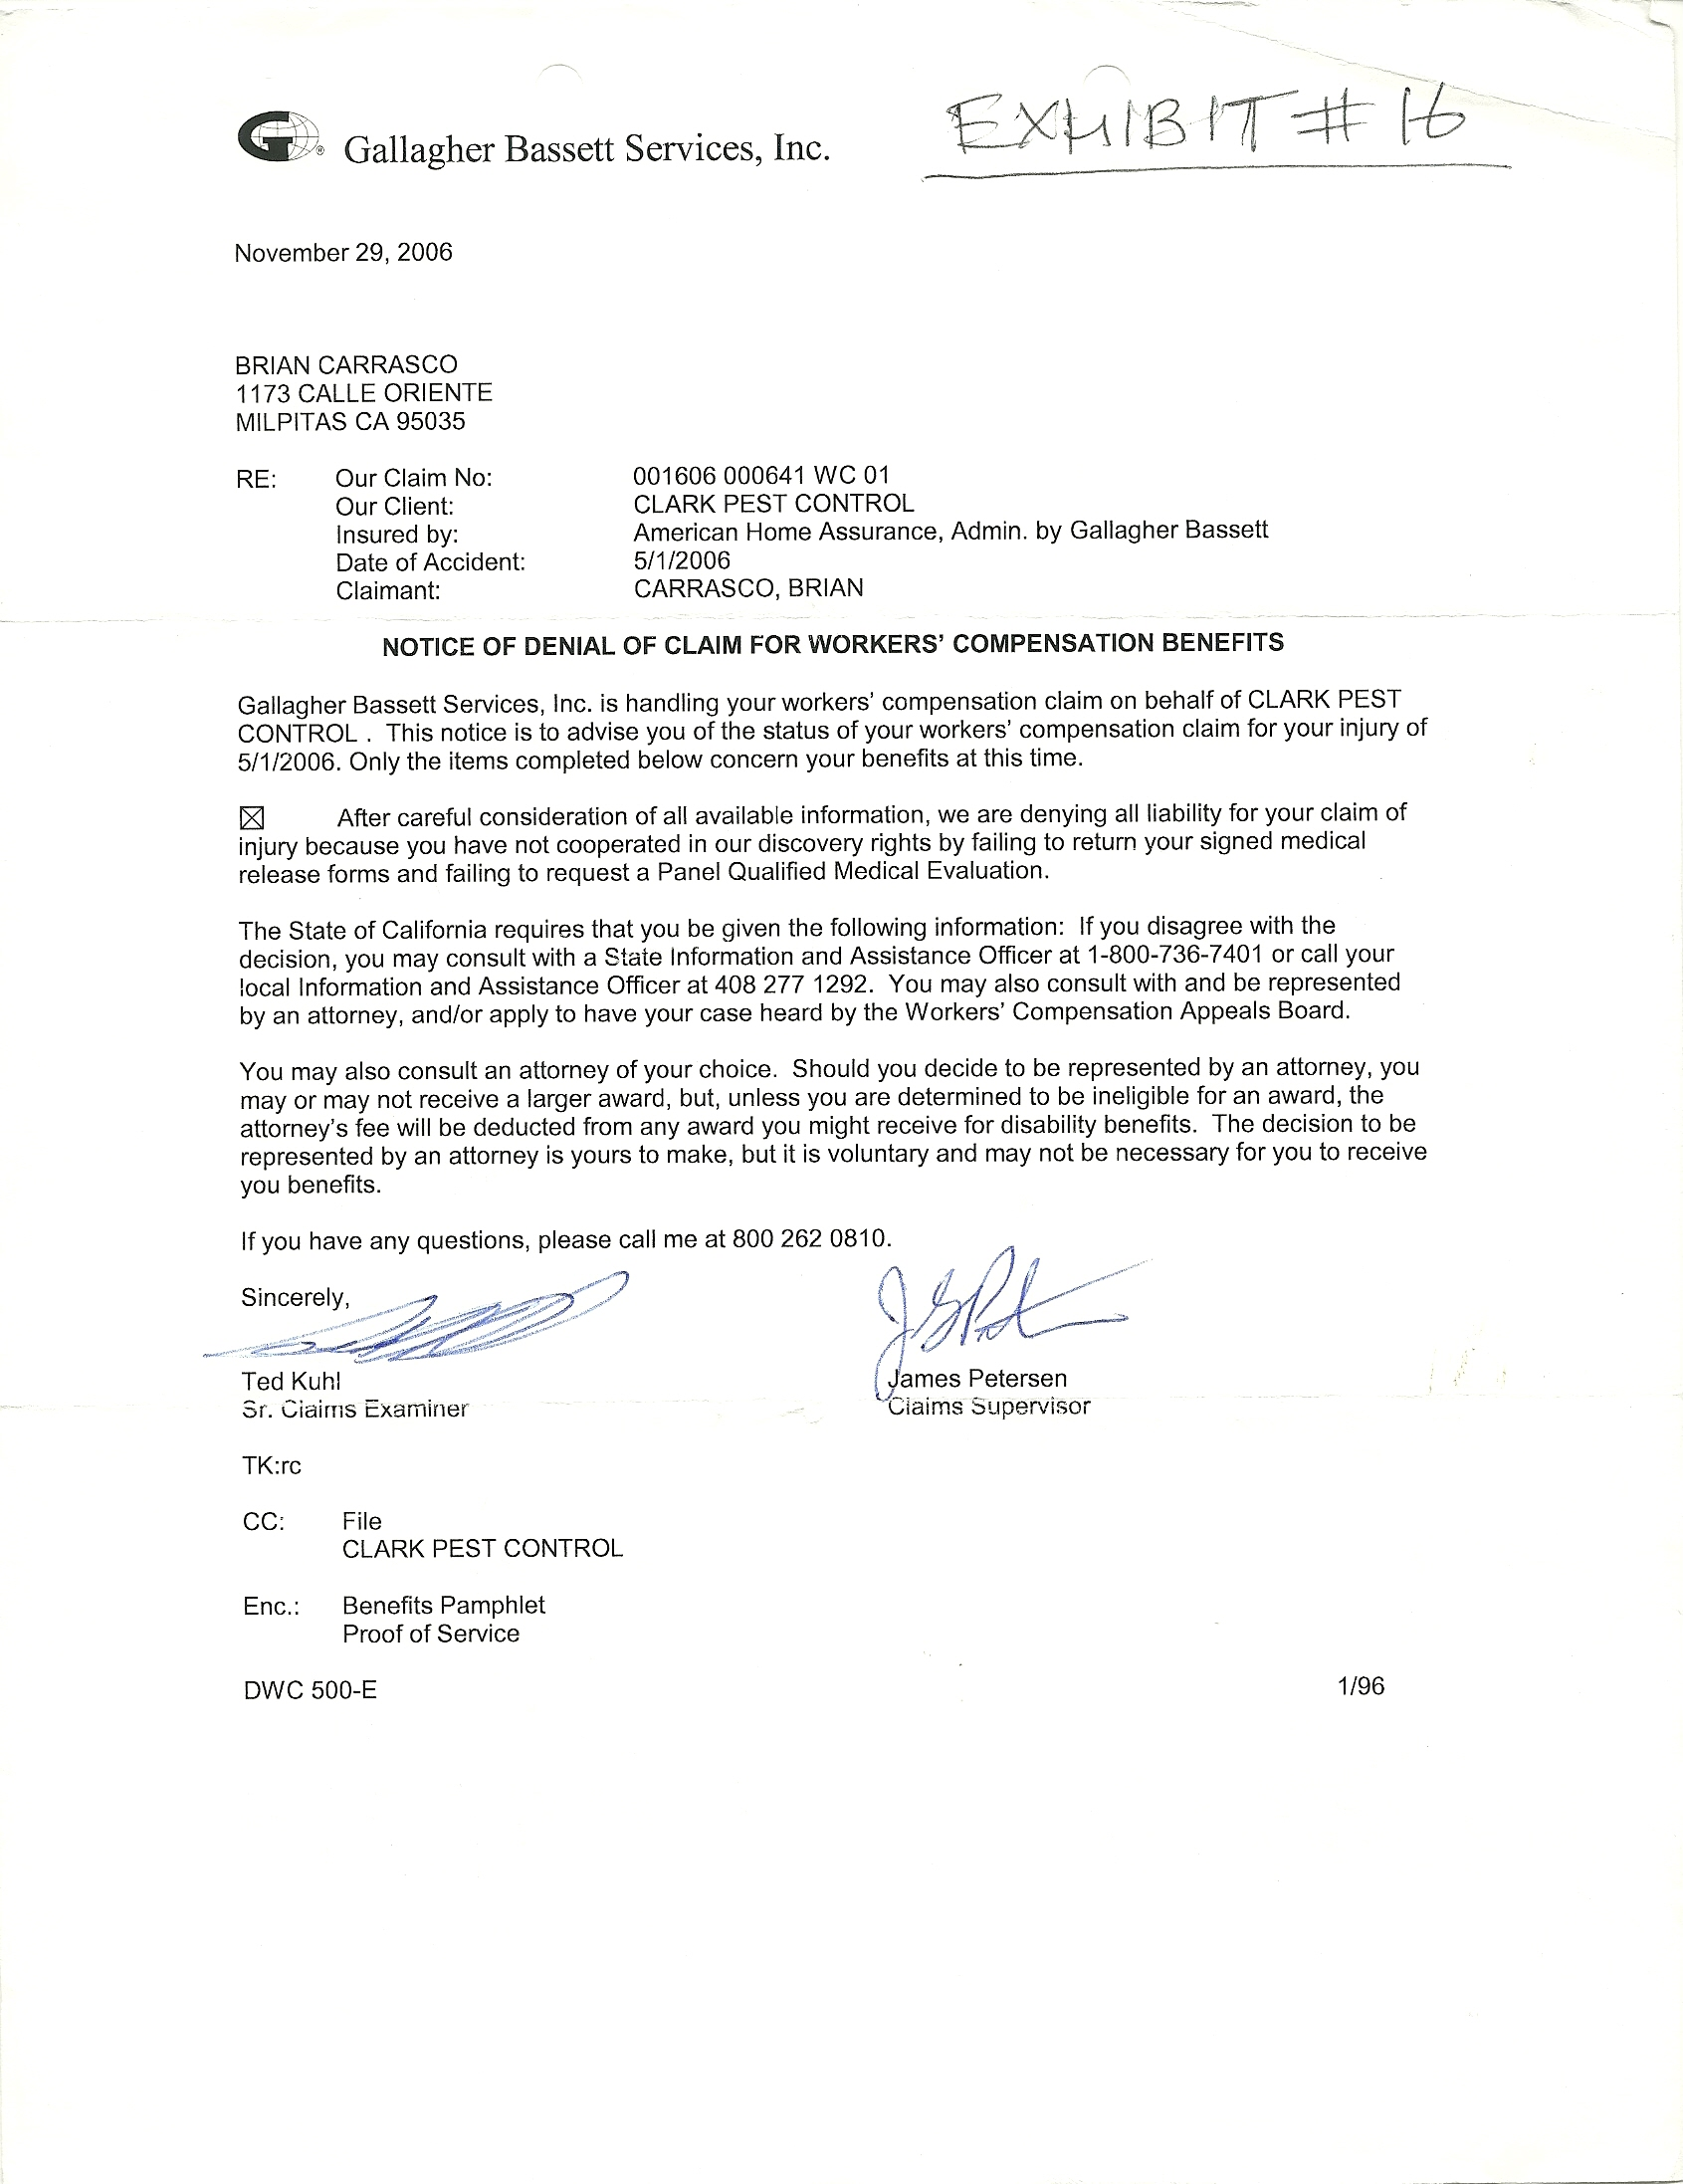 Denial Claim Letter Sample from brc998.files.wordpress.com